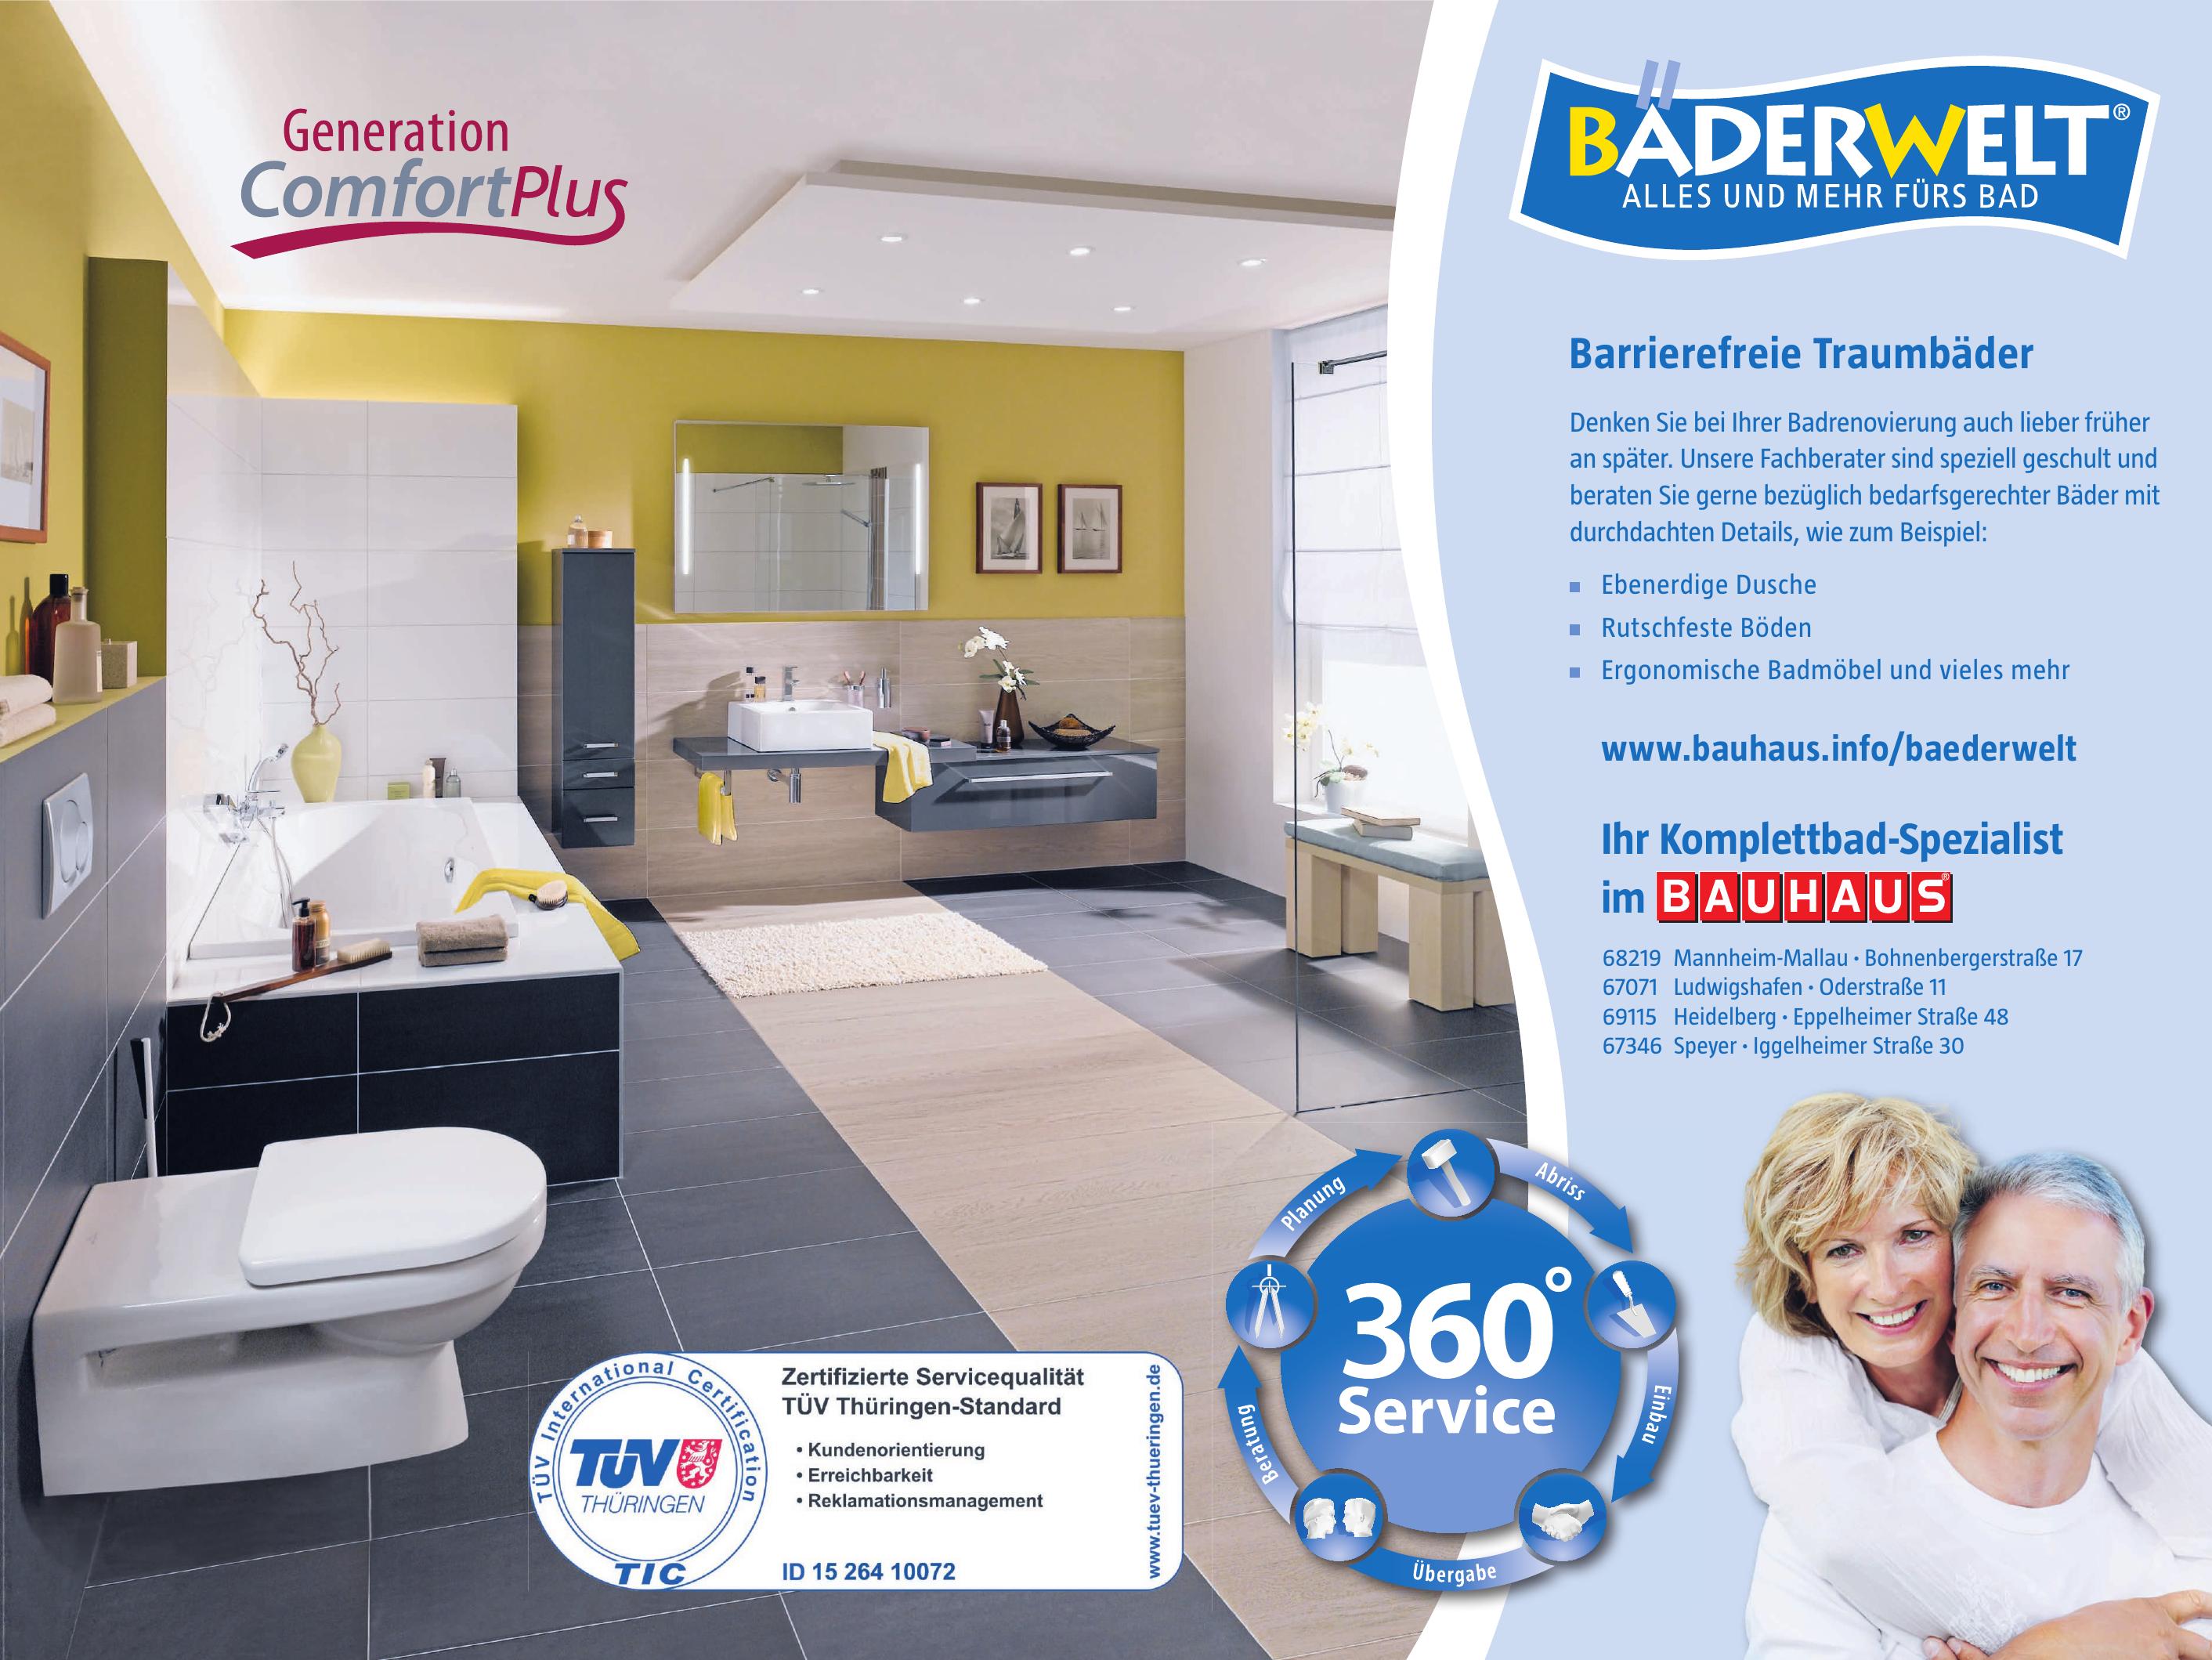 Bauhaus GmbH - Baderwelt